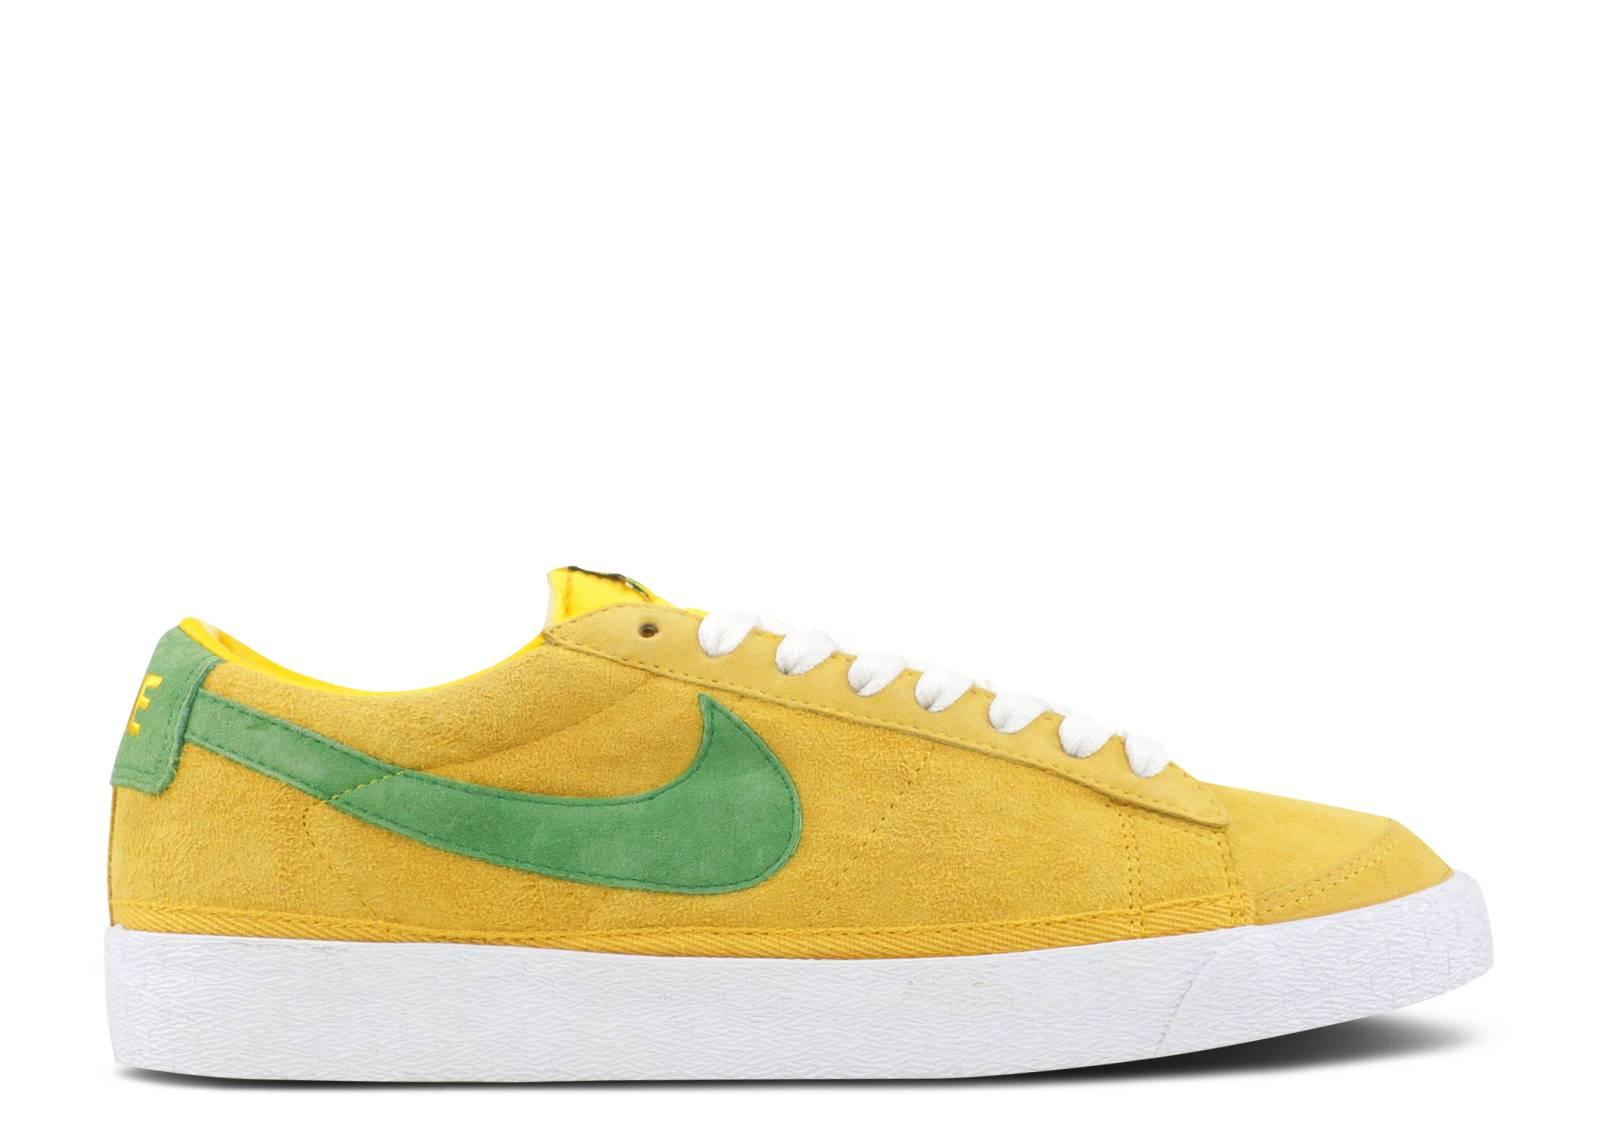 reputable site a1aad 86117 Nike Blazer Low - Nike - 305930 731 - green/yellow/white ...